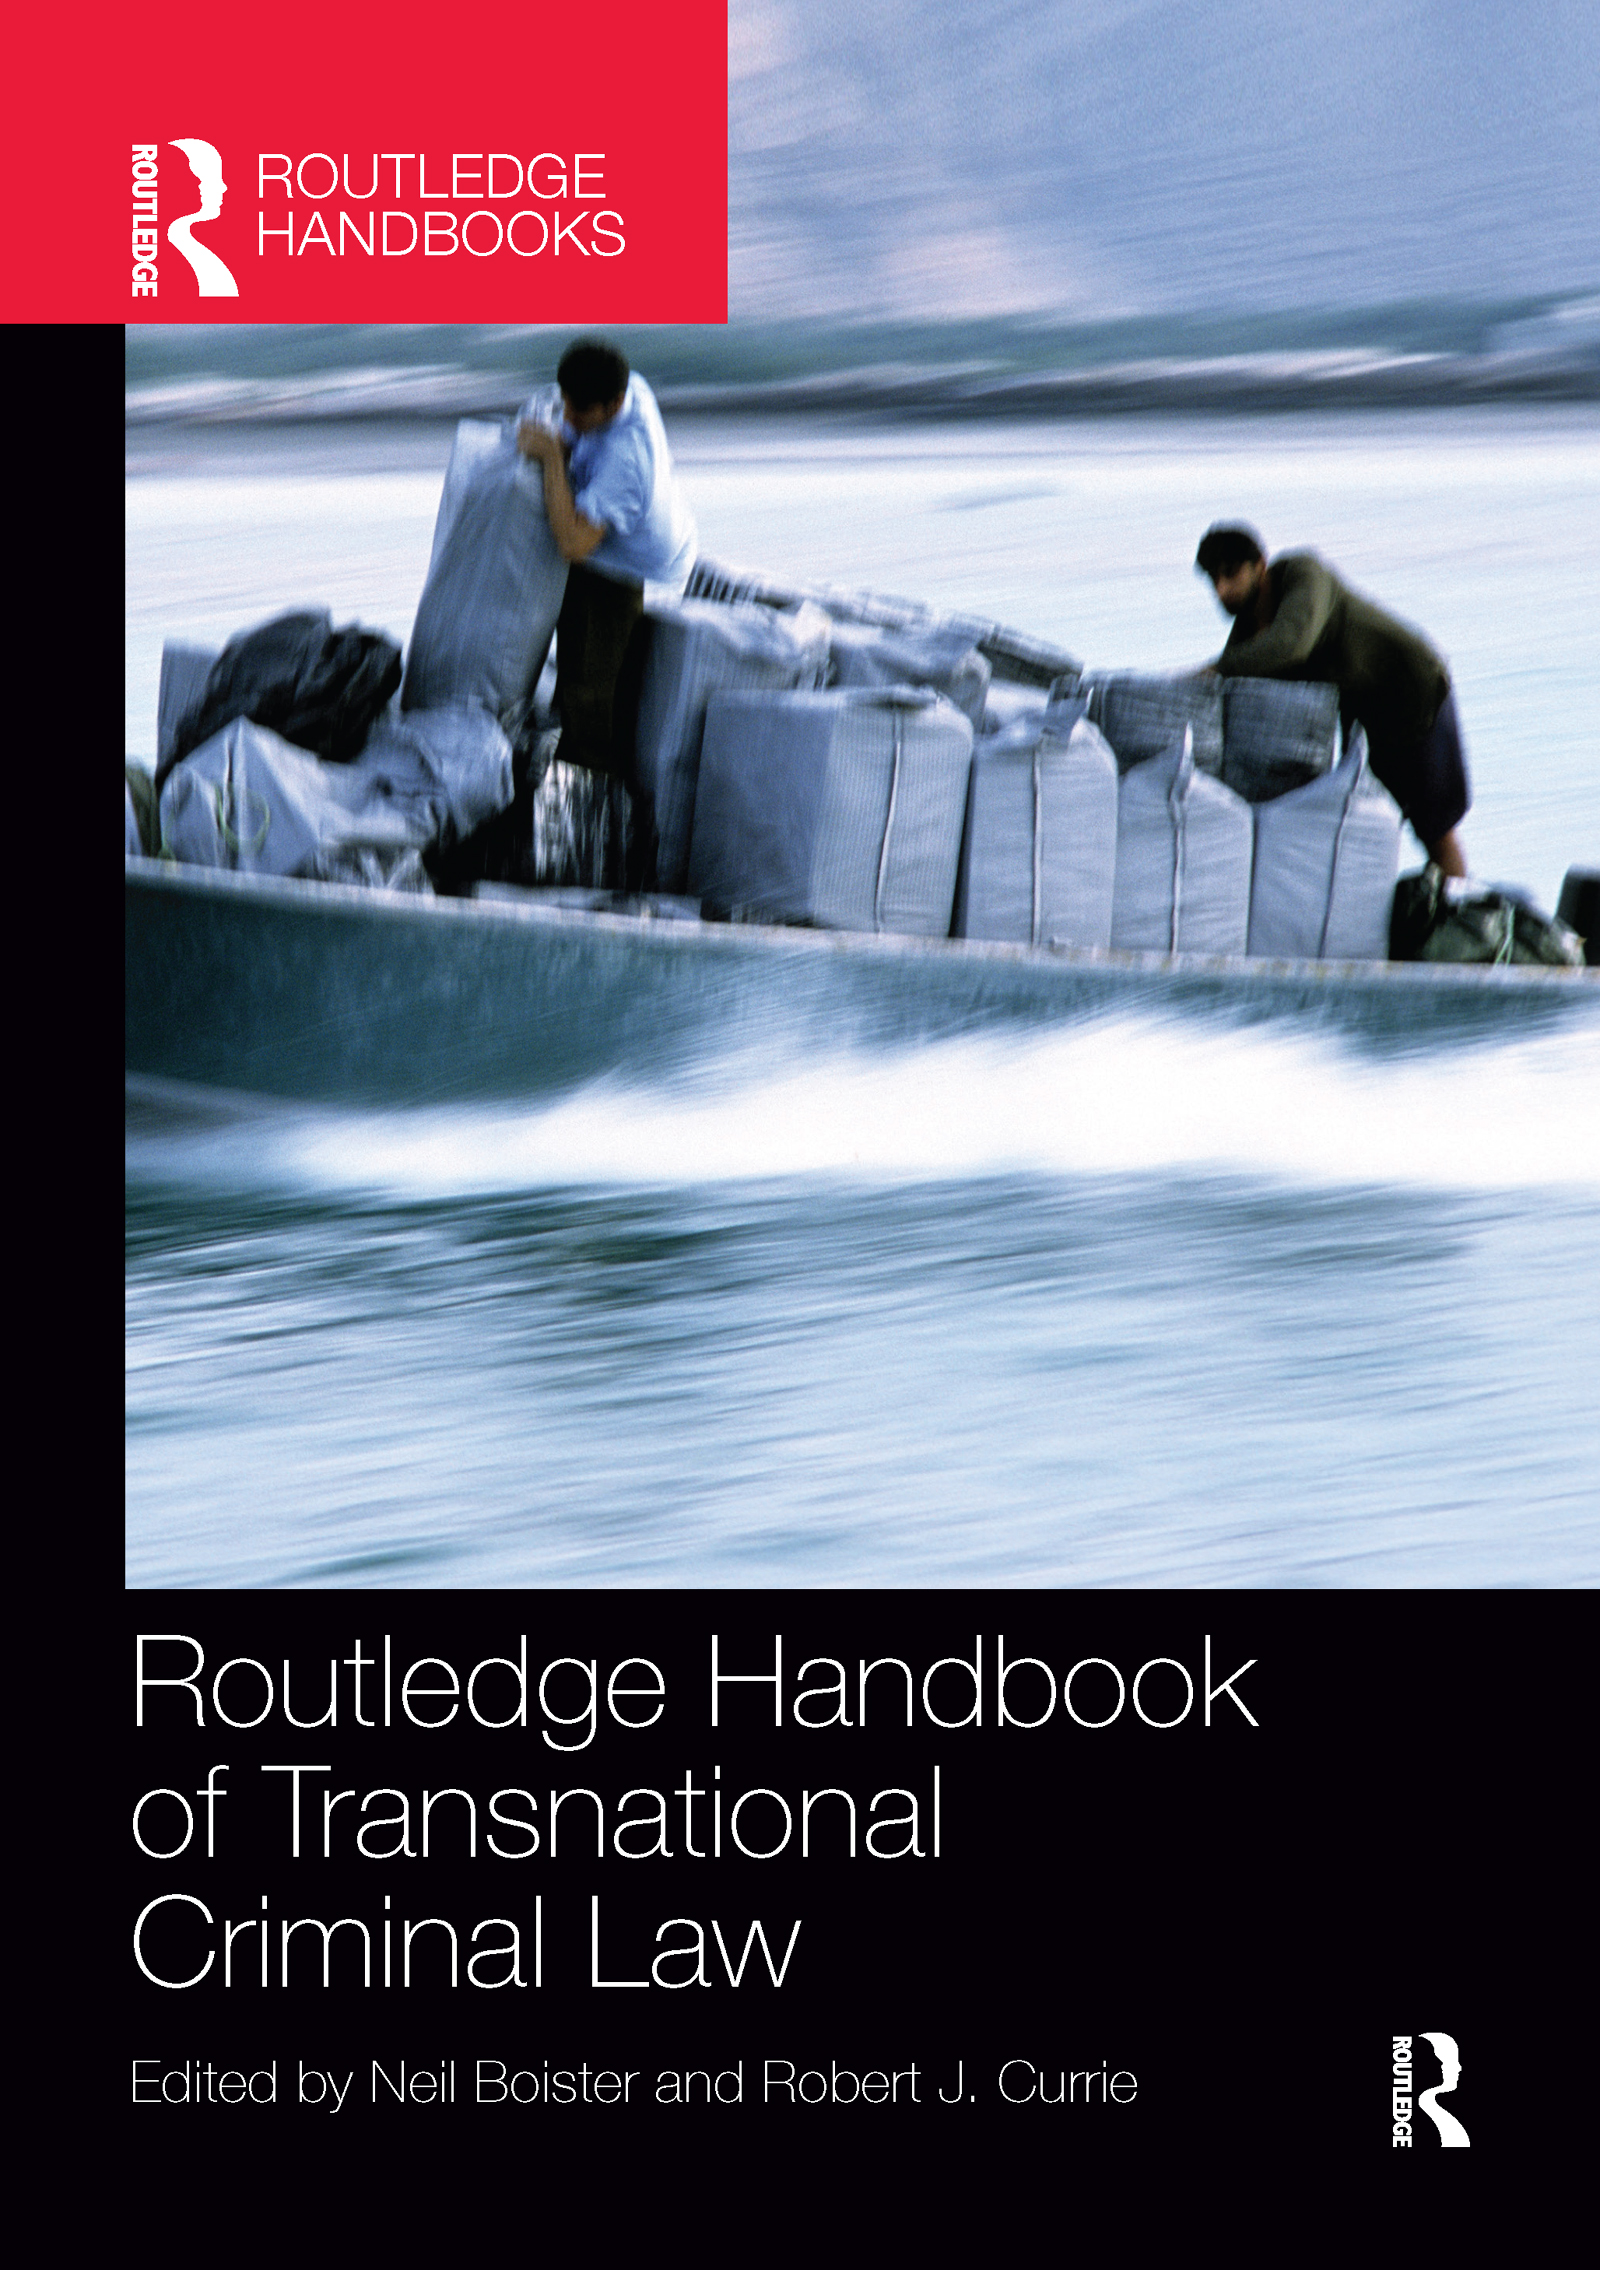 Routledge Handbook of Transnational Criminal Law